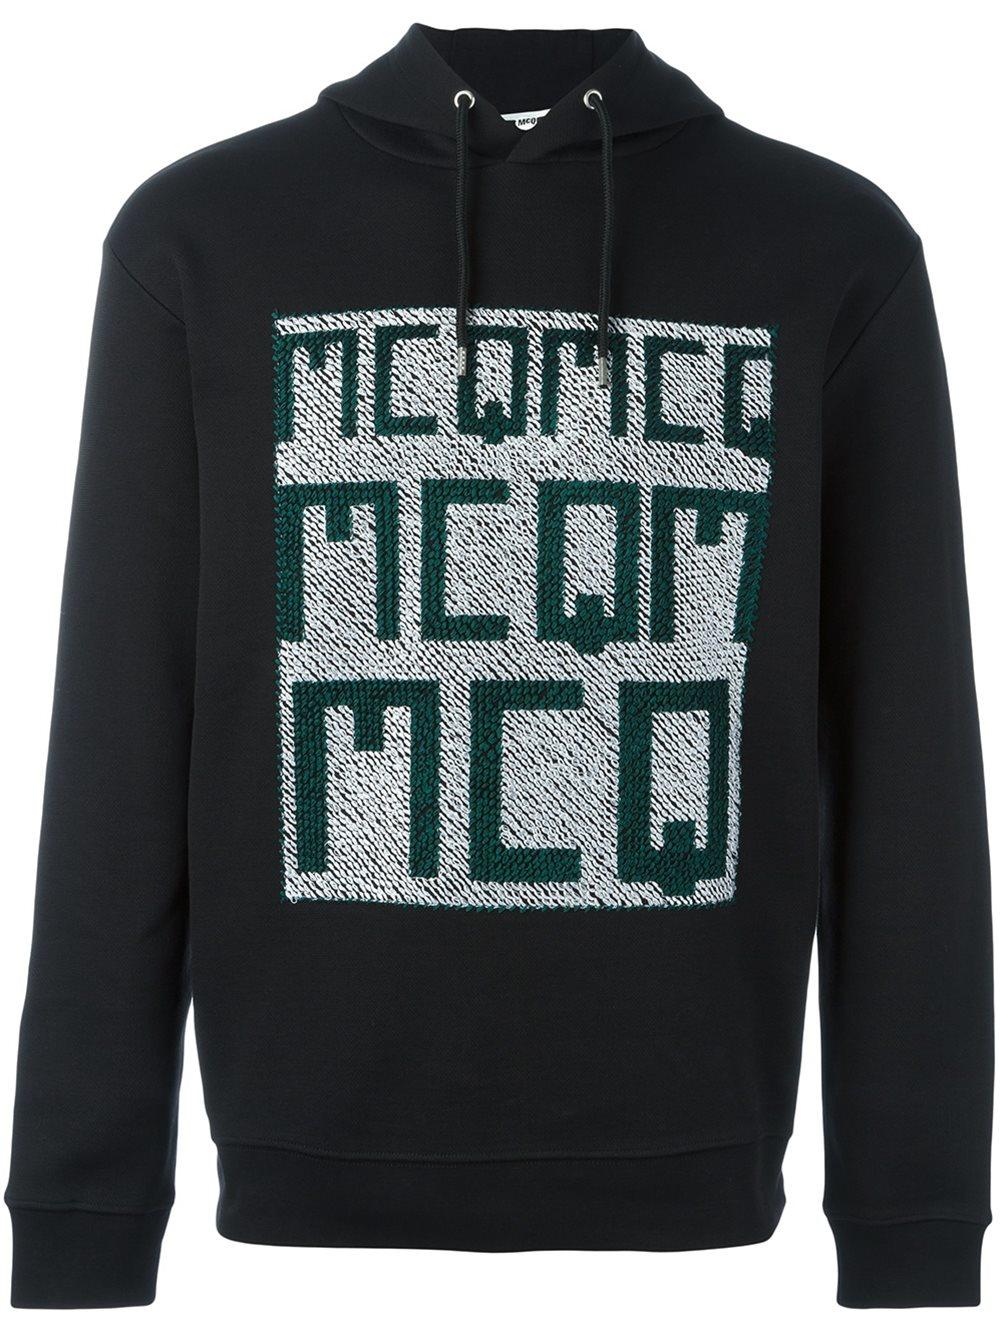 mcq alexander mcqueen logo print hoodie in black for men lyst. Black Bedroom Furniture Sets. Home Design Ideas